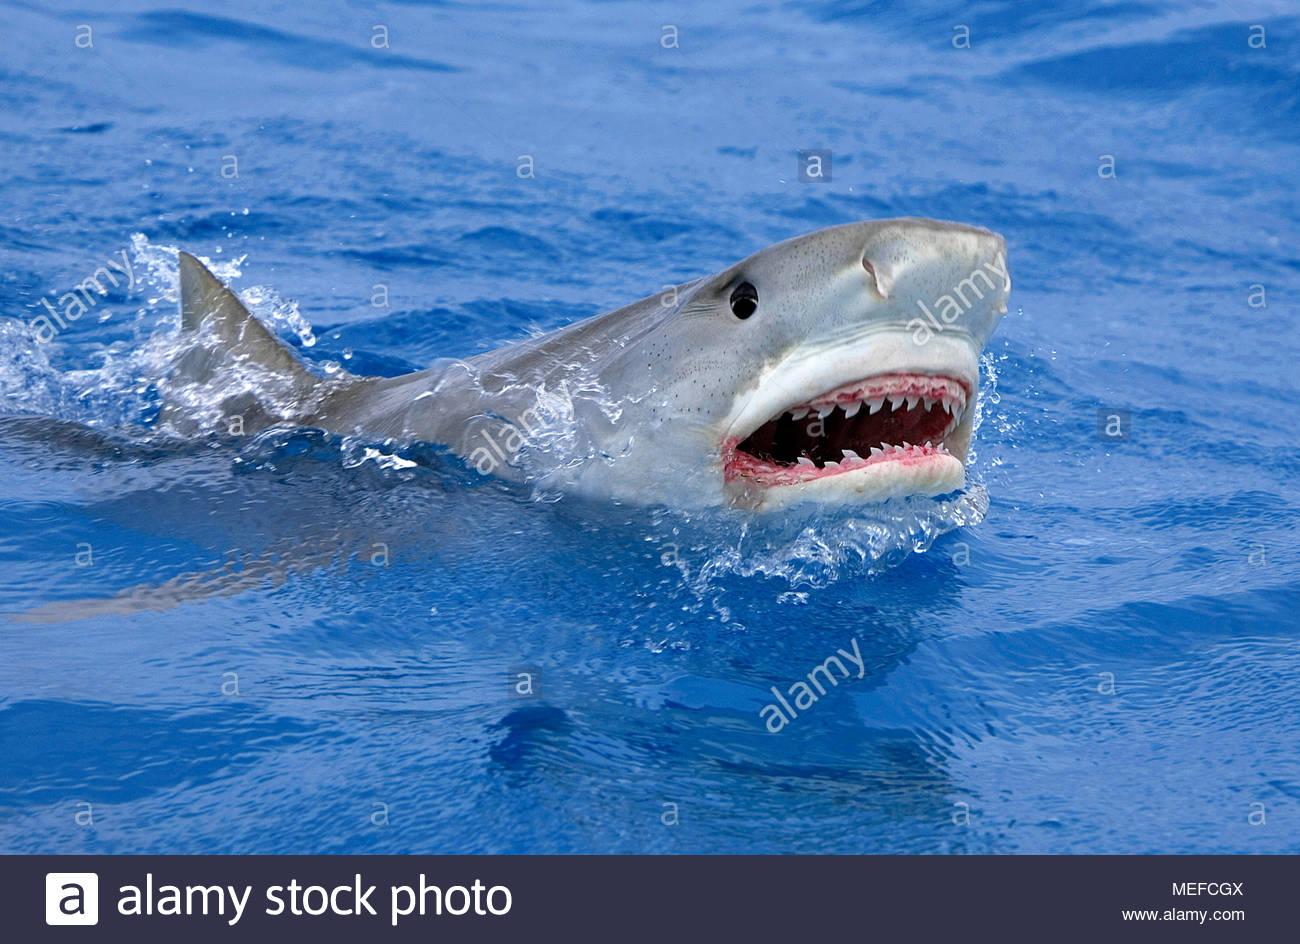 Tigerhai (Galeocerdo cuvier) an der Wasseroberfläche, Bahamas | Tiger shark (Galeocerdo cuvier) at surface, Bahamas - Stock Image